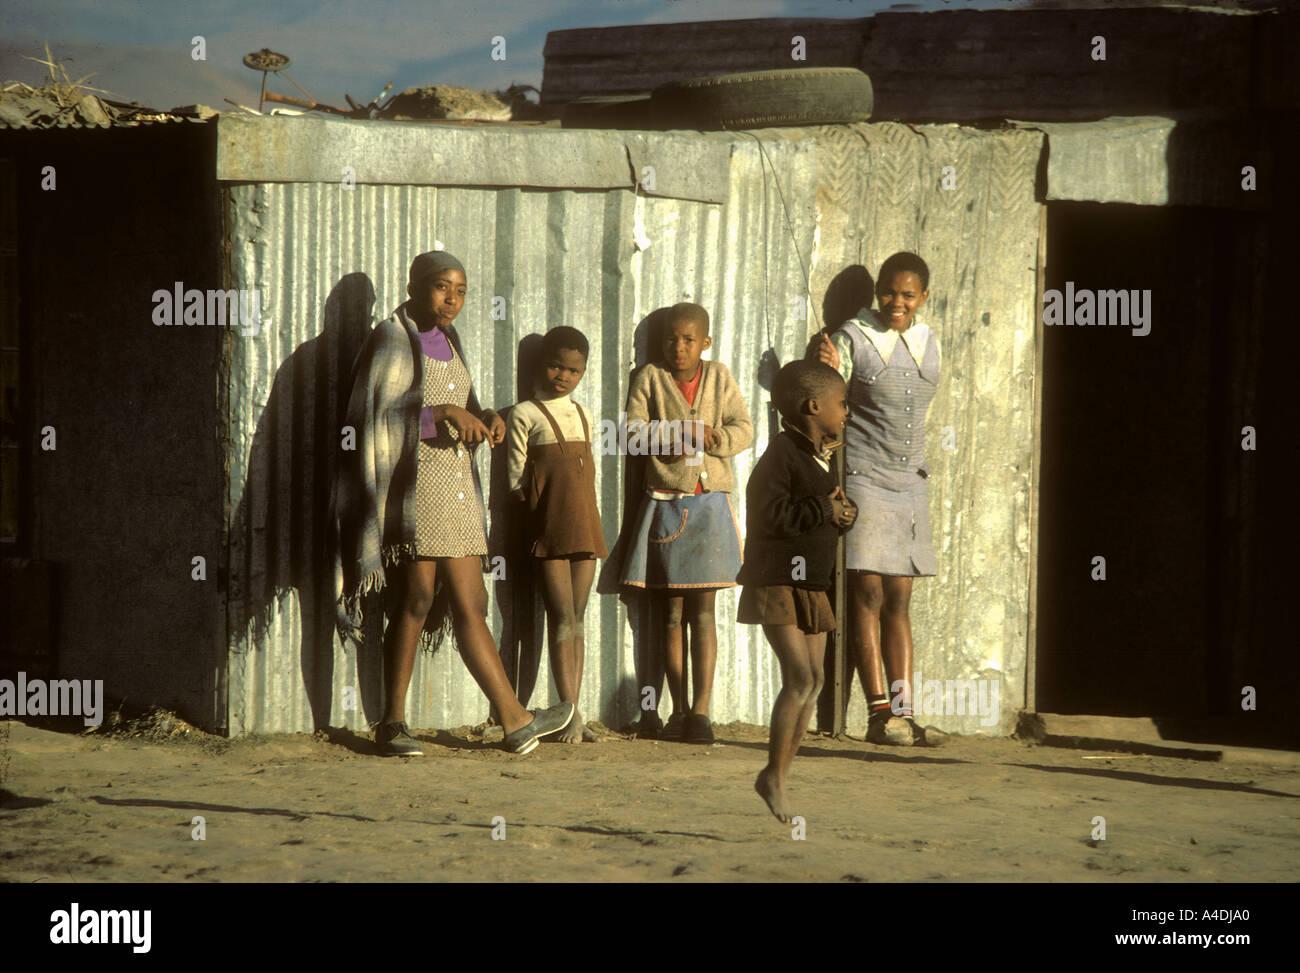 Children. Qwa Qwa homelands, South Africa, 1980 - Stock Image